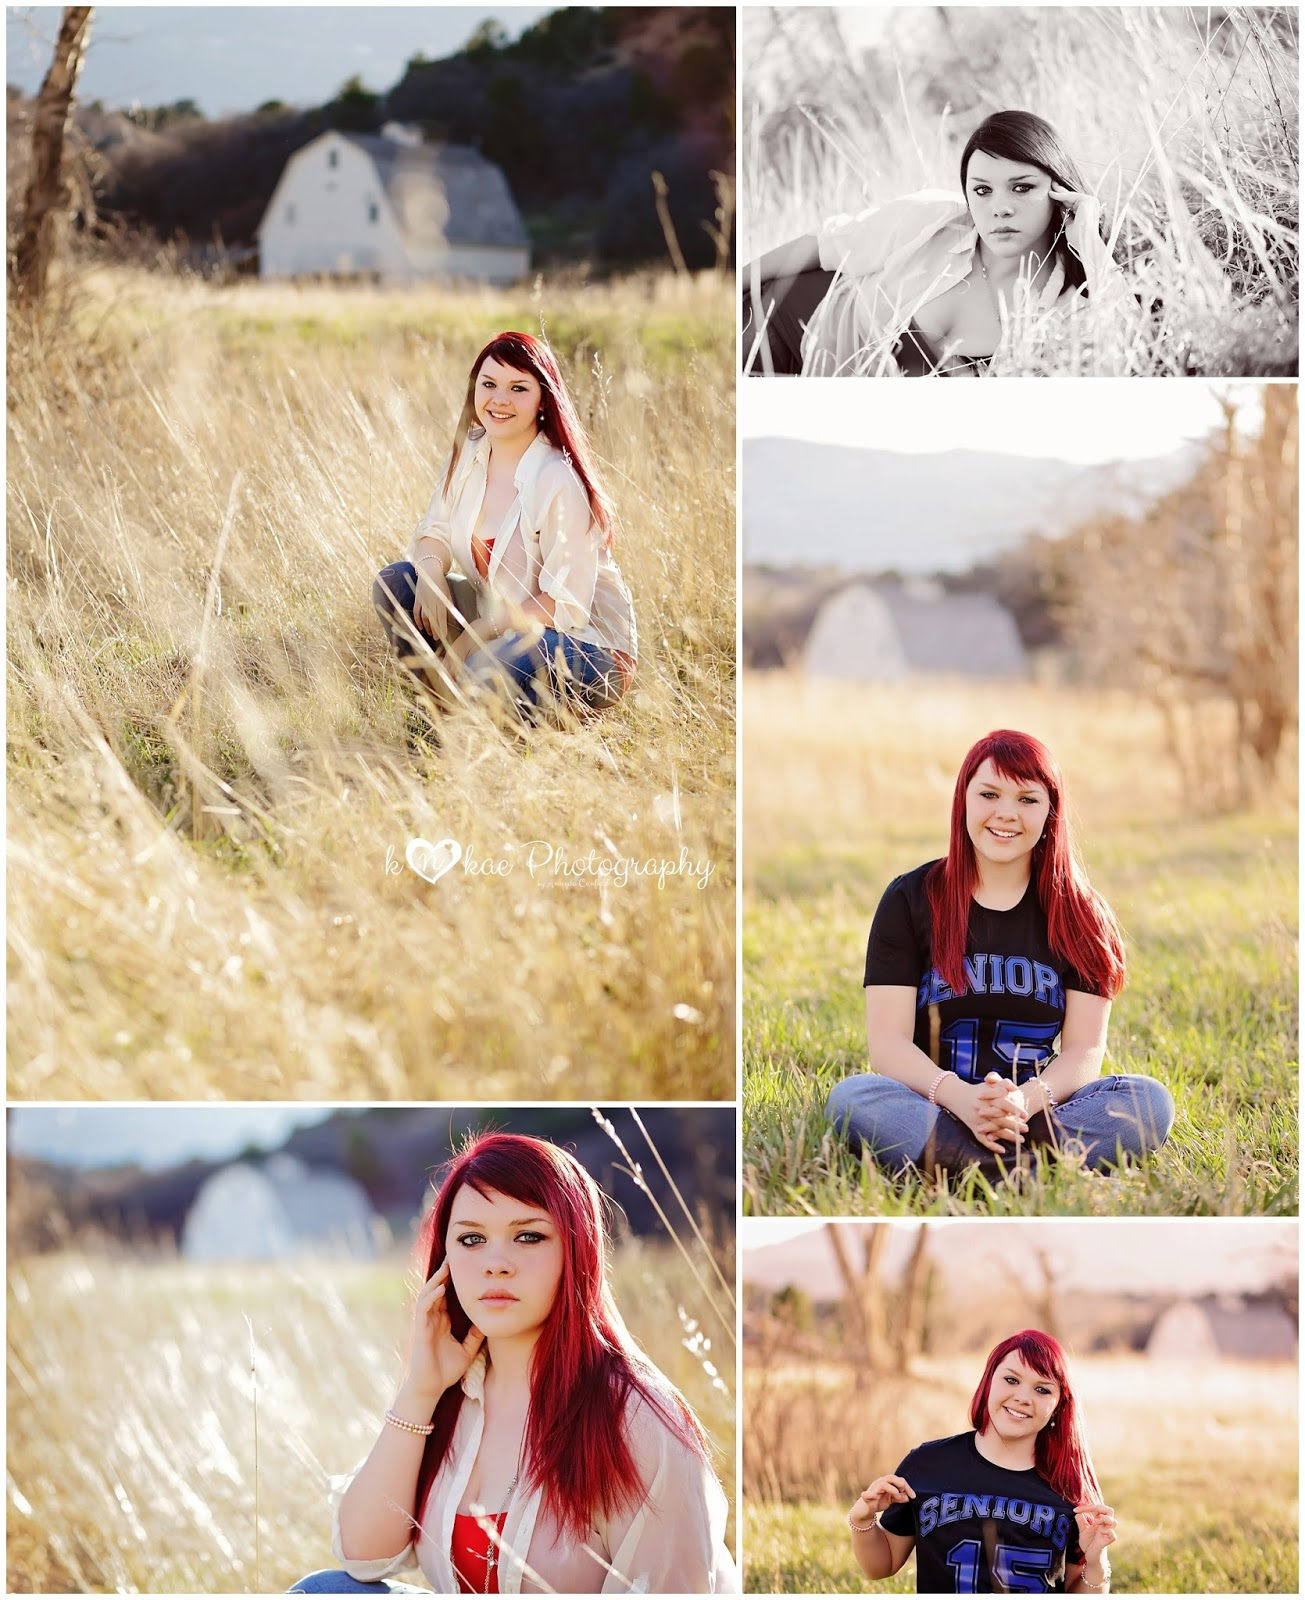 6 month milestone session // studio portrait // colorado springs // k 'n kae photography // studio // infant  // sitter, Custom Photography, Senior session, Pregnancy announcement || colorado springs || sunset session || golden hour || k 'n kae photography || couples session, Rock Ledge Ranch, rock ledge ranch || k 'n kae photography || Colorado springs || Portrait session || Family Session || Fort Carson ||,